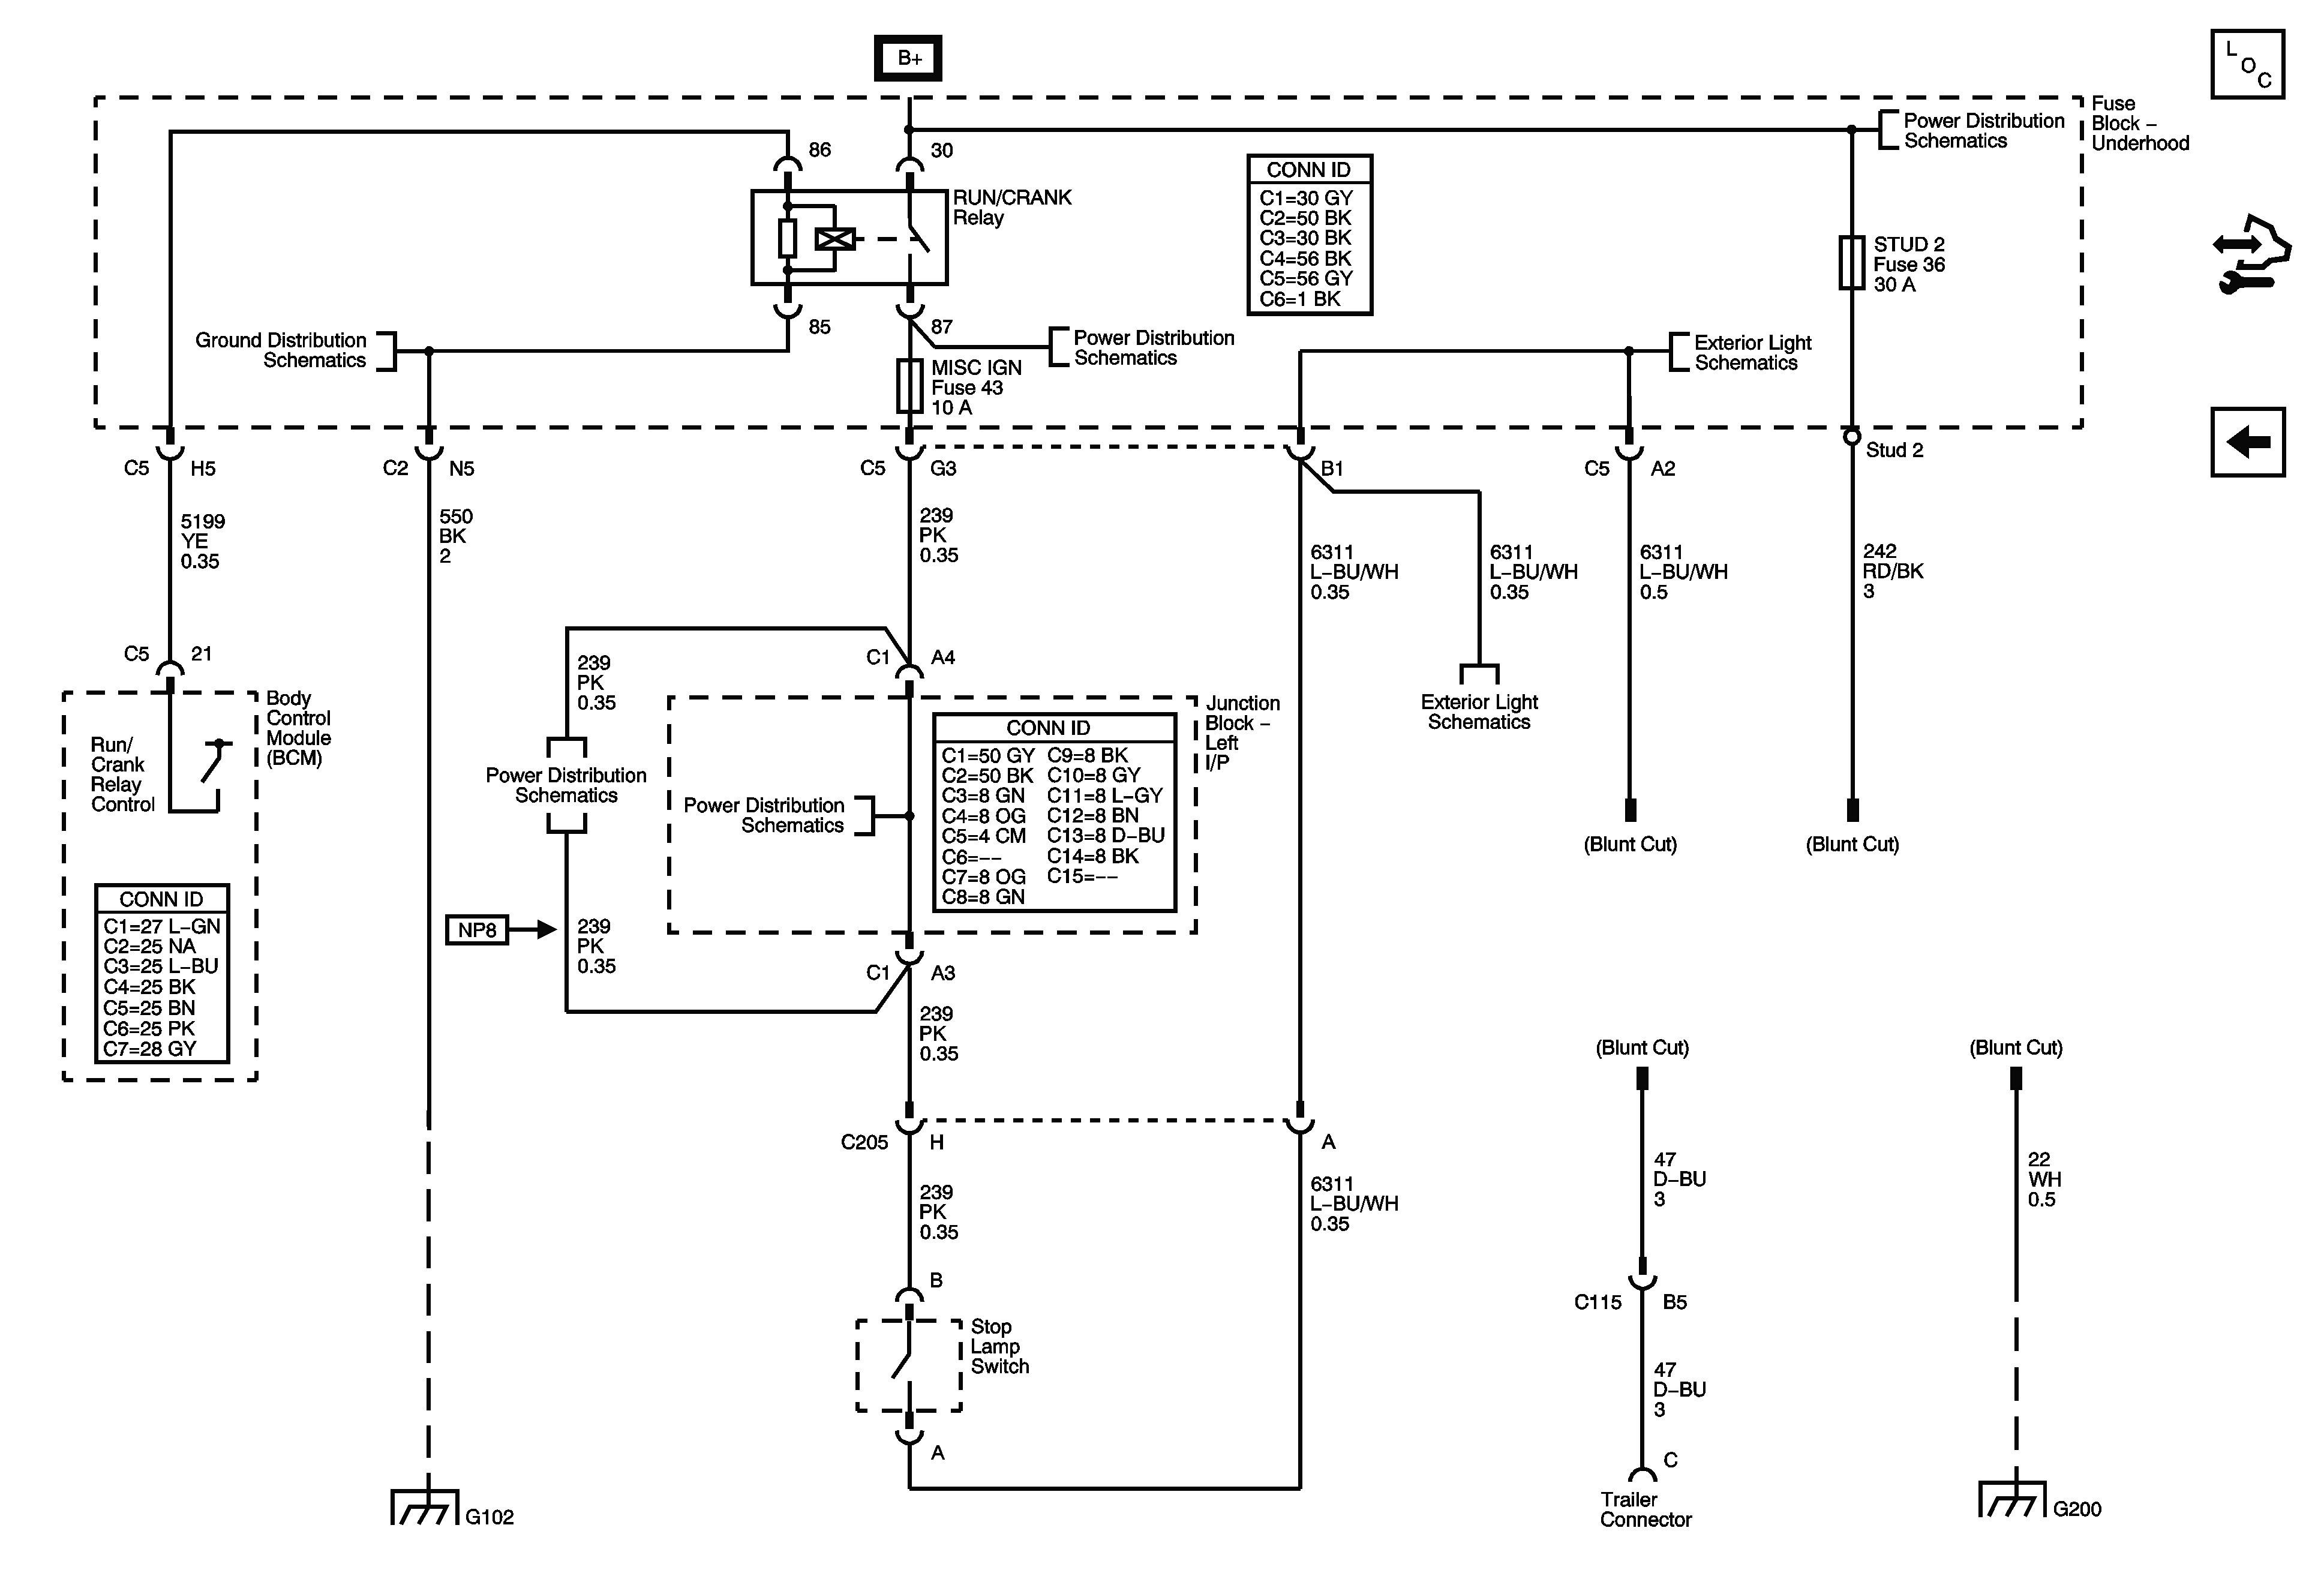 Wiring Diagram For Redarc Electric Brake Controller New Wiring Diagram How To Wire A Redarc Electric Brake Controller And